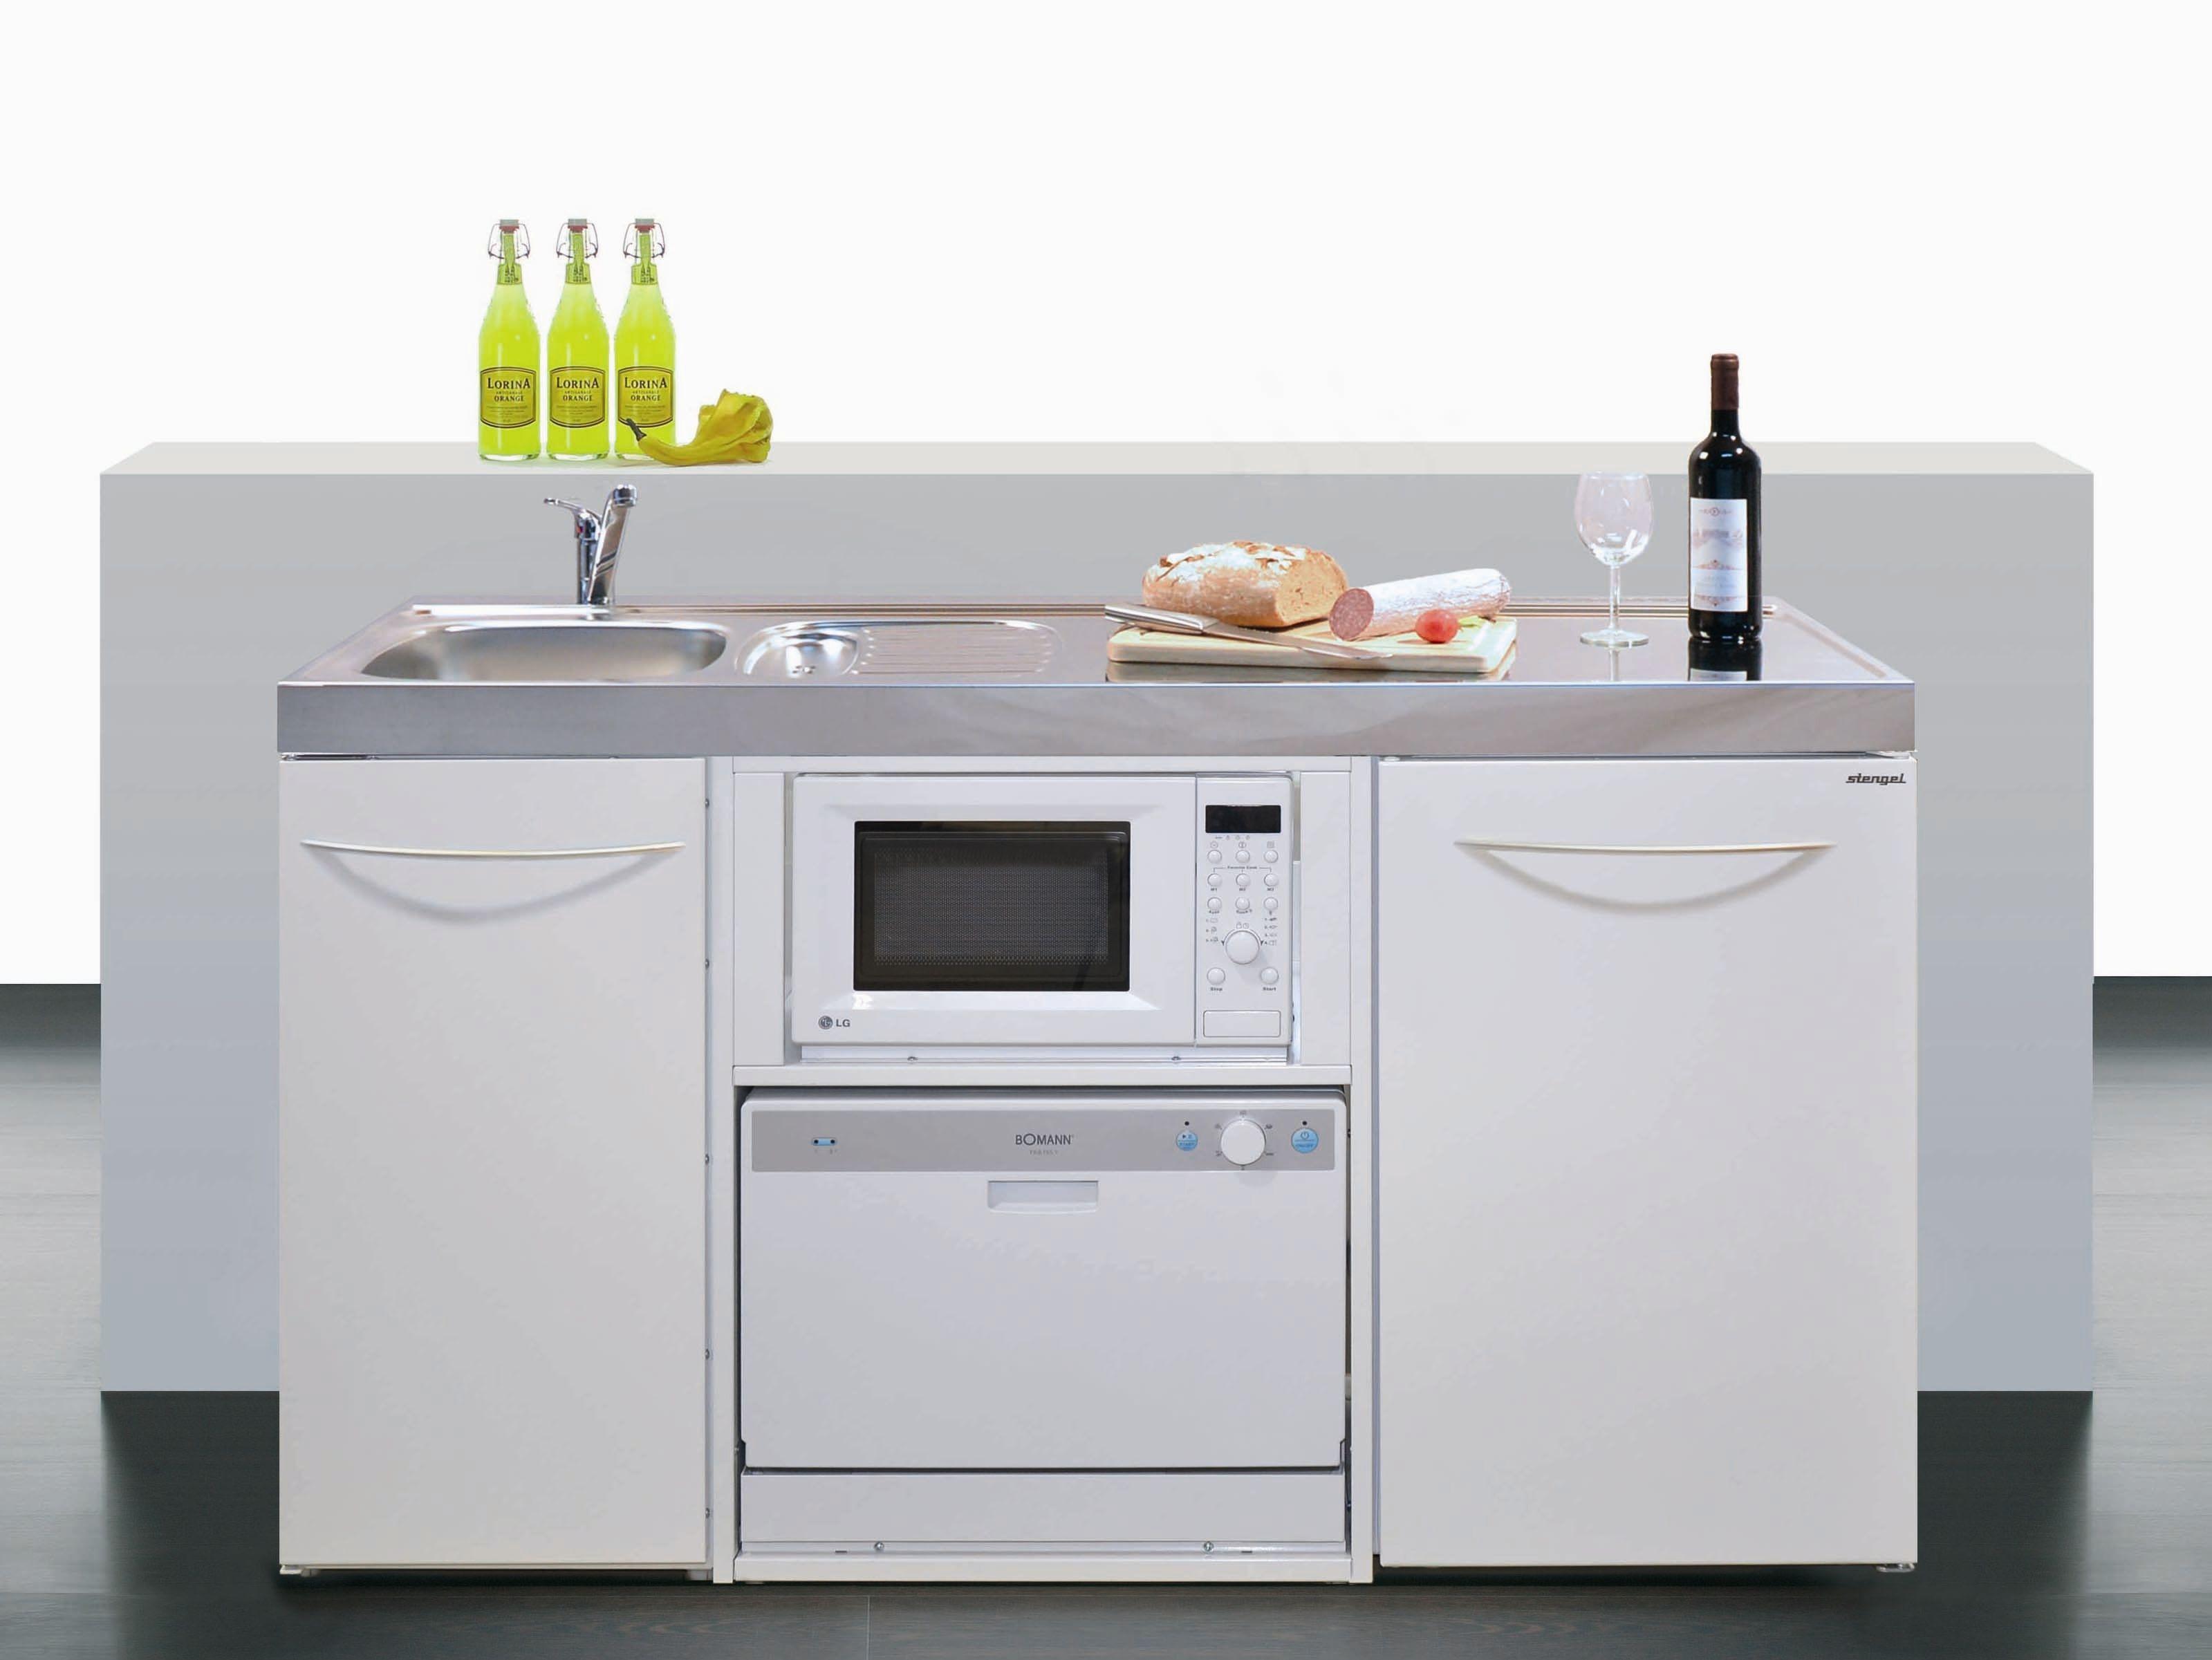 small kitchen dishwashers kyocera 1500mm to include fridge dishwasher microwave elfin